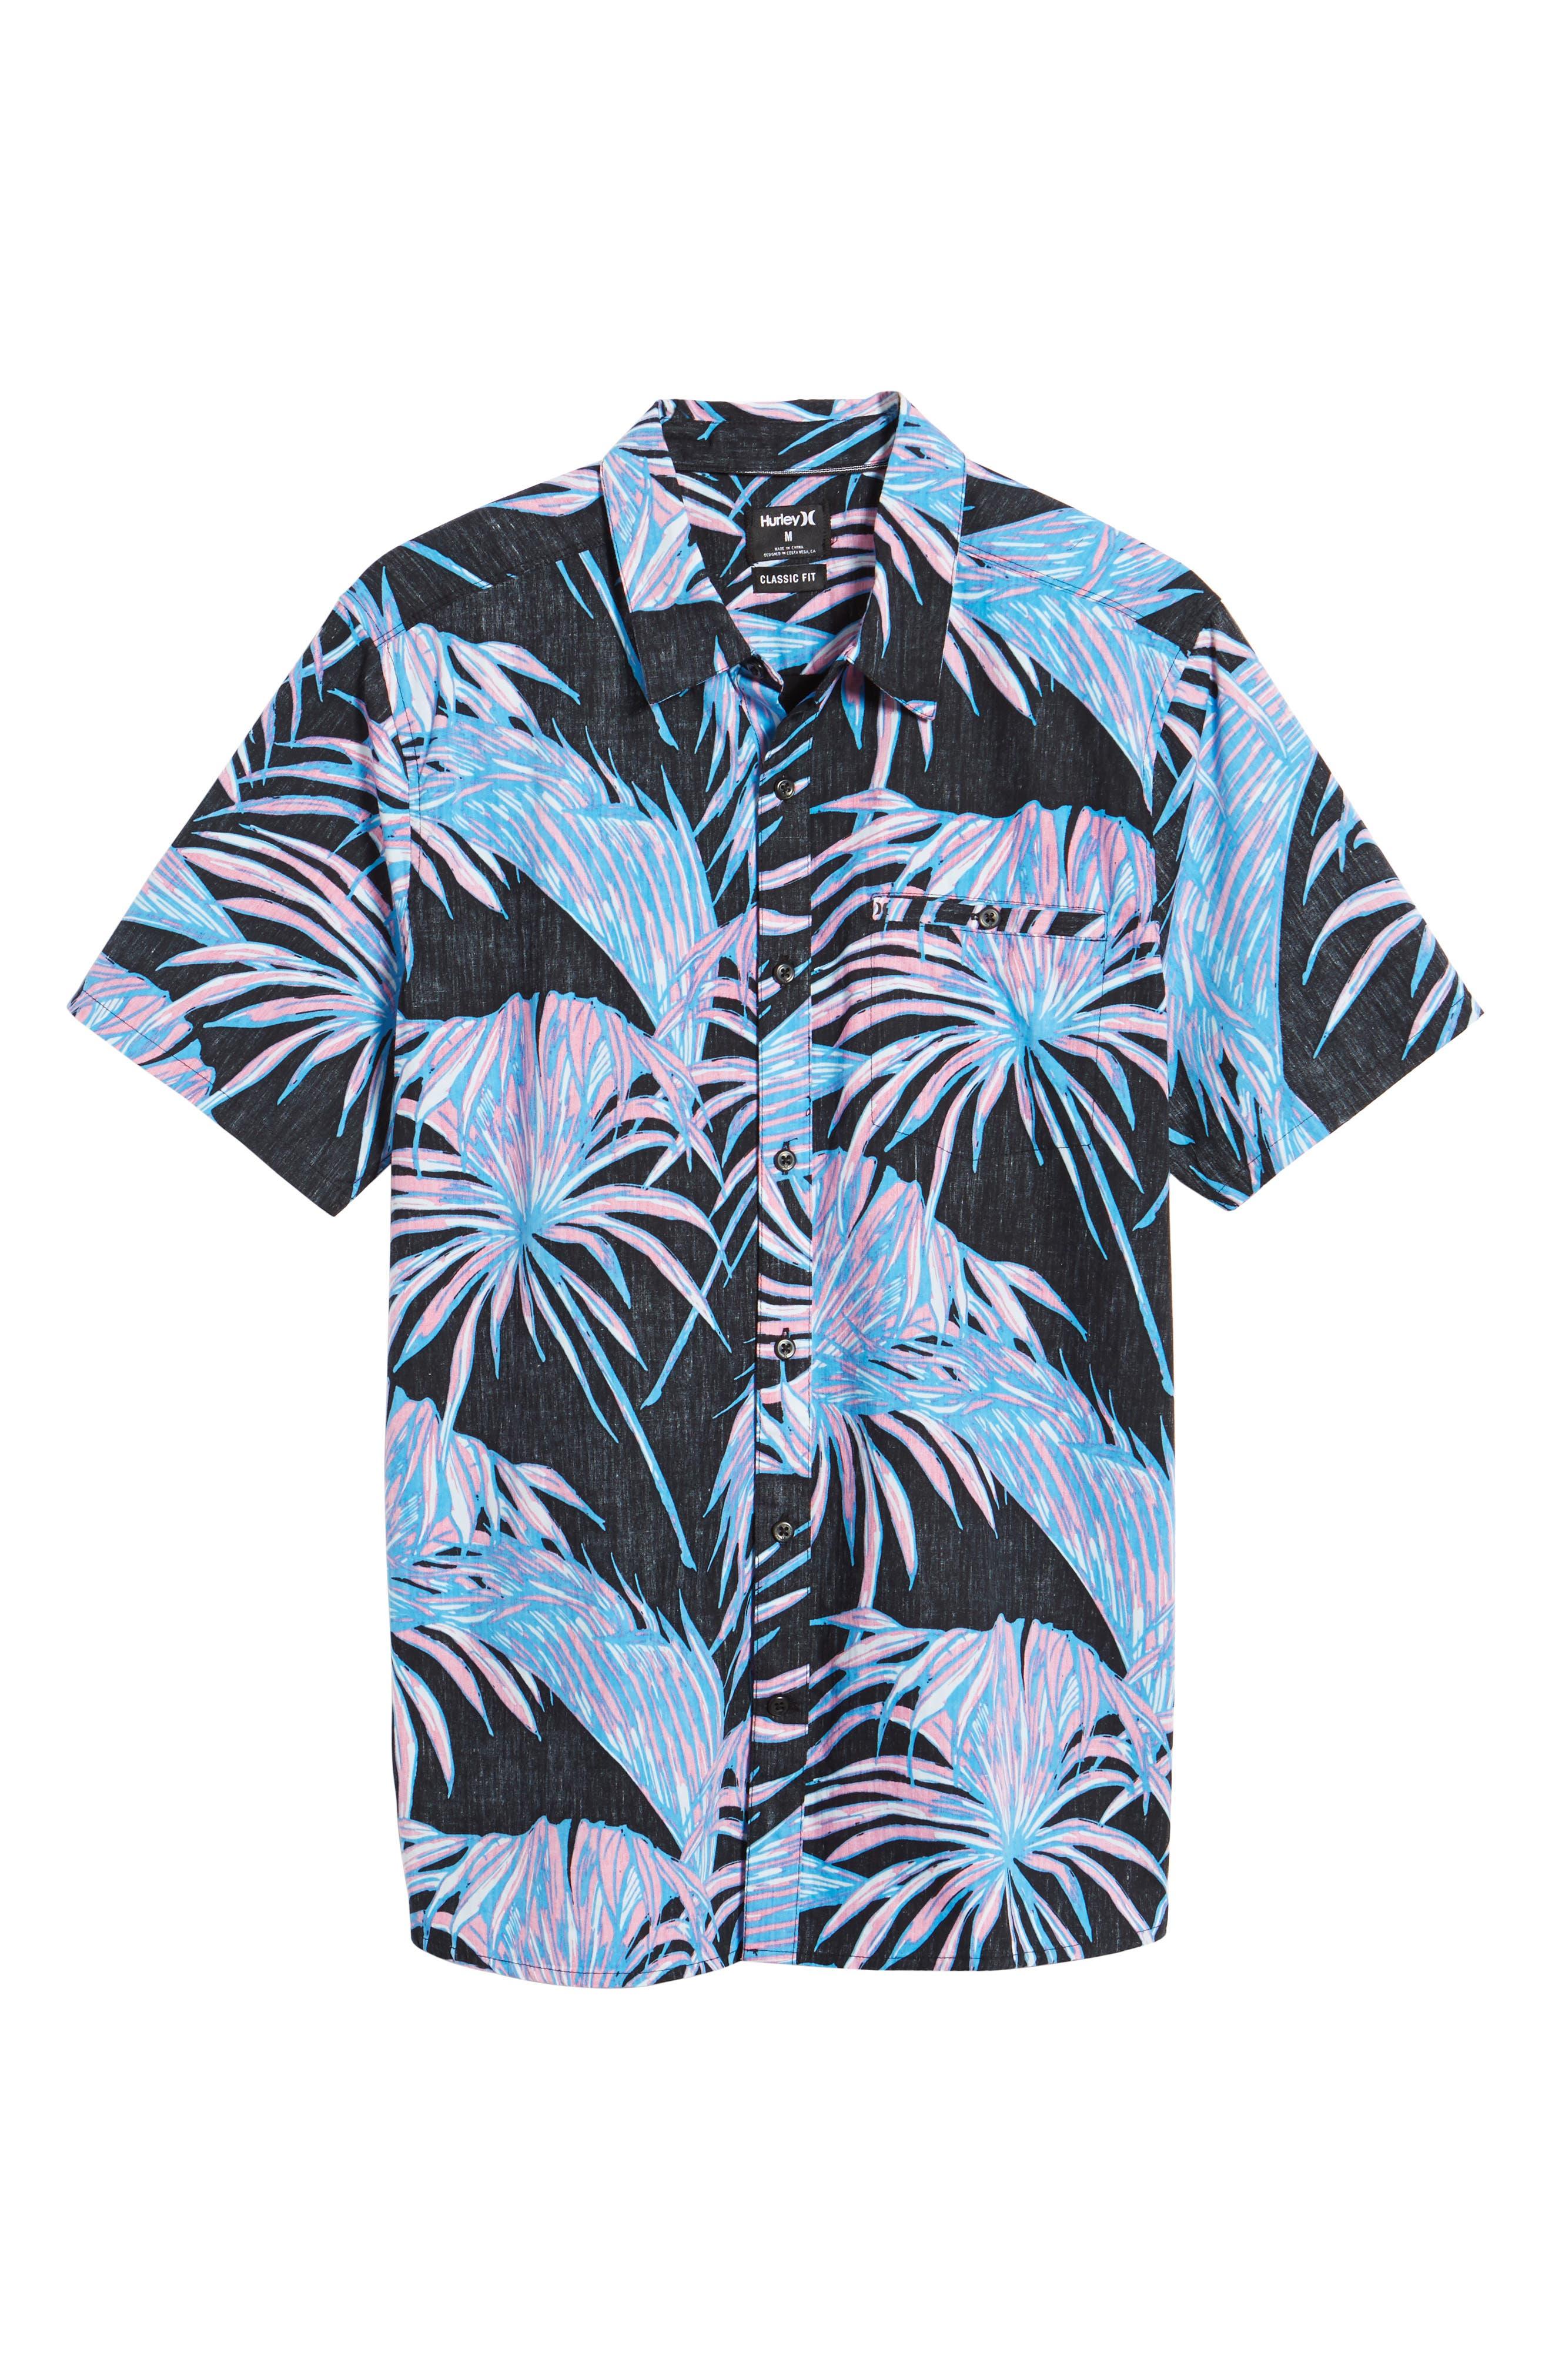 Koko Shirt,                             Alternate thumbnail 6, color,                             Black